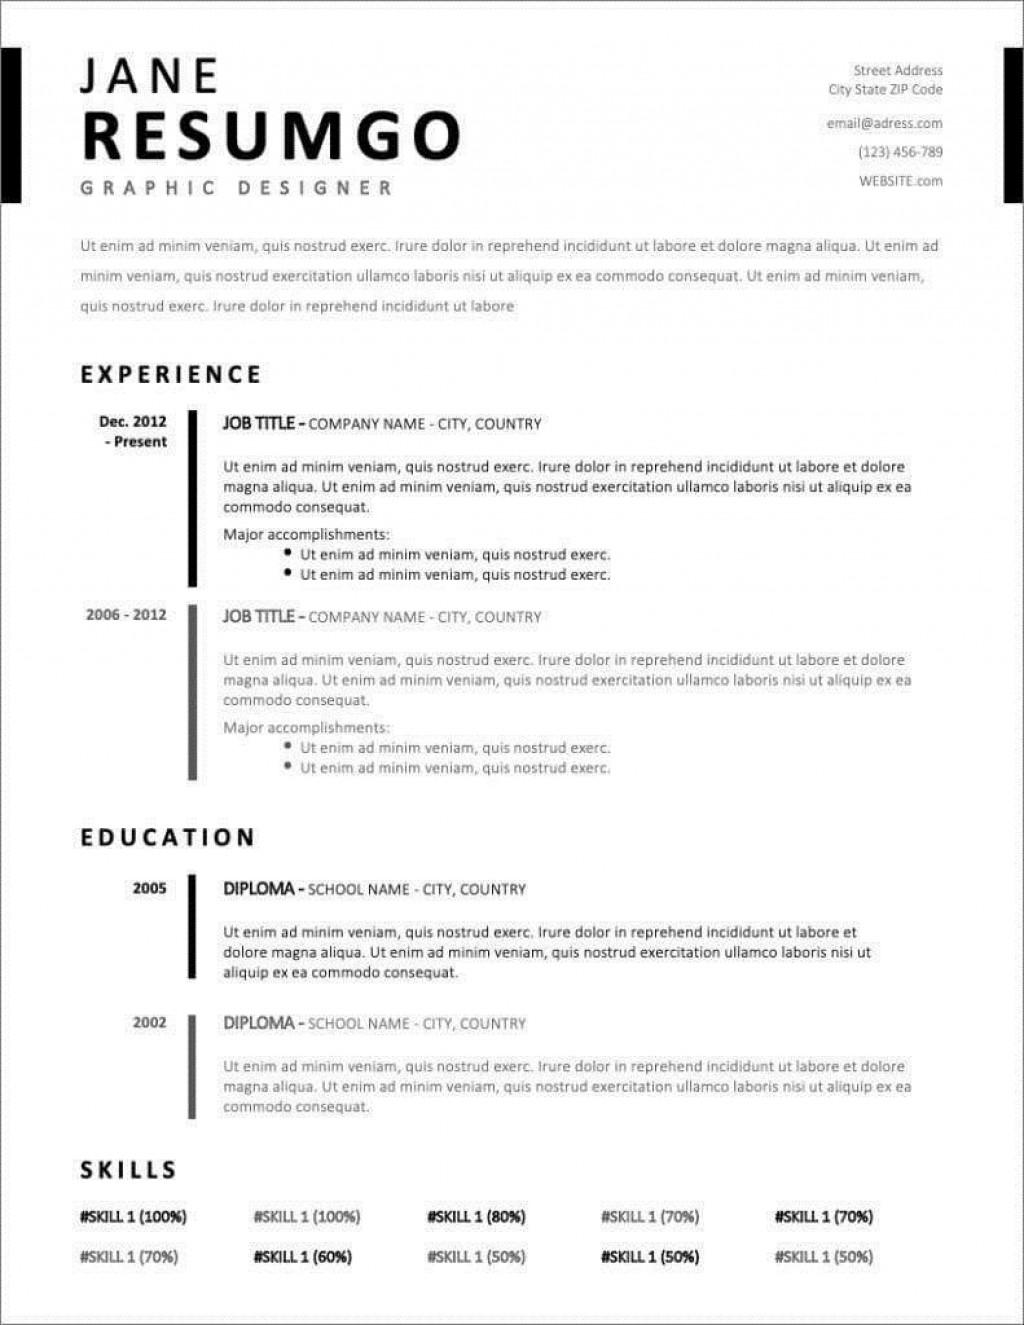 005 Surprising Resume Template For Free Photo  Best Word Freelance Writer MicrosoftLarge